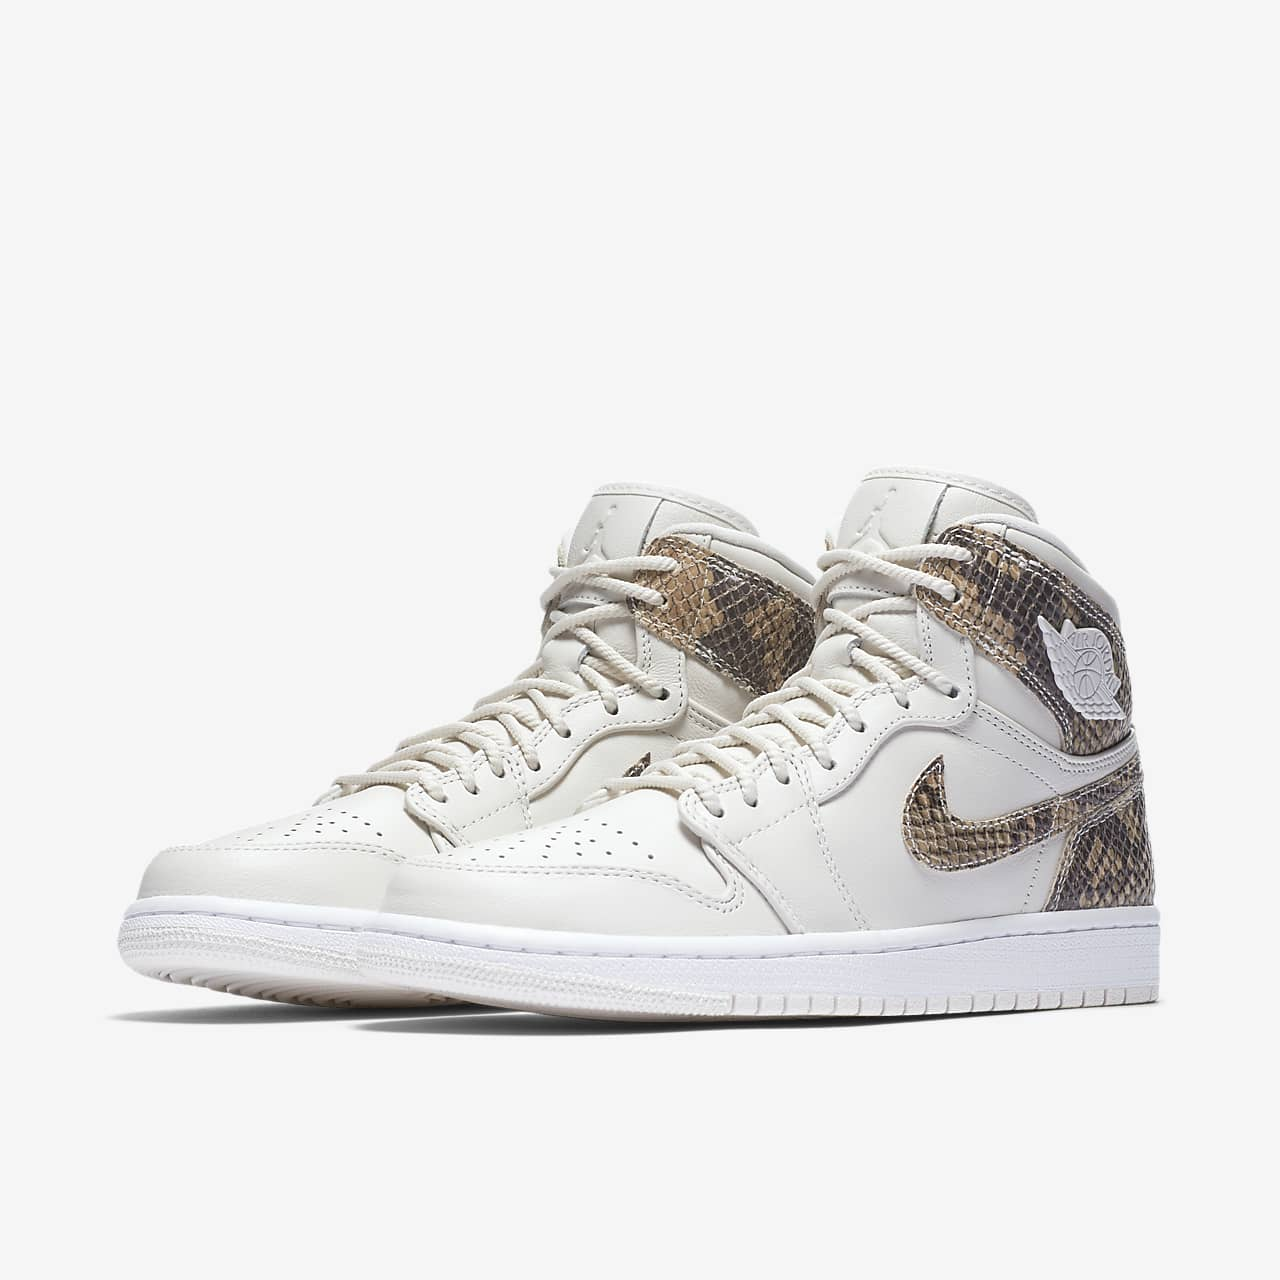 Air Jordan 1 Retro High Premium Women's Shoe